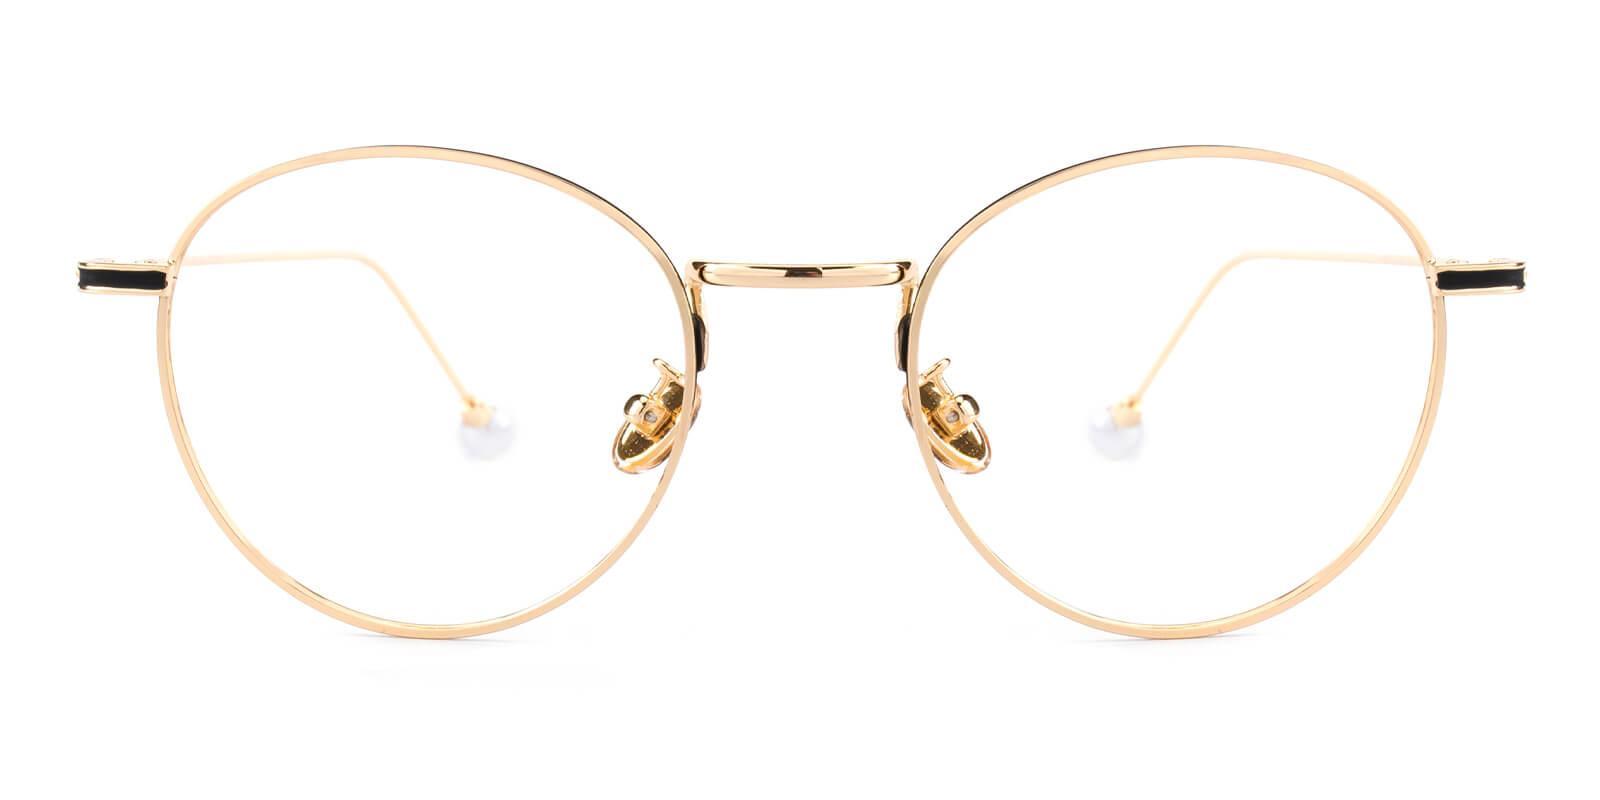 Frail-Gold-Round-Metal-Eyeglasses-detail